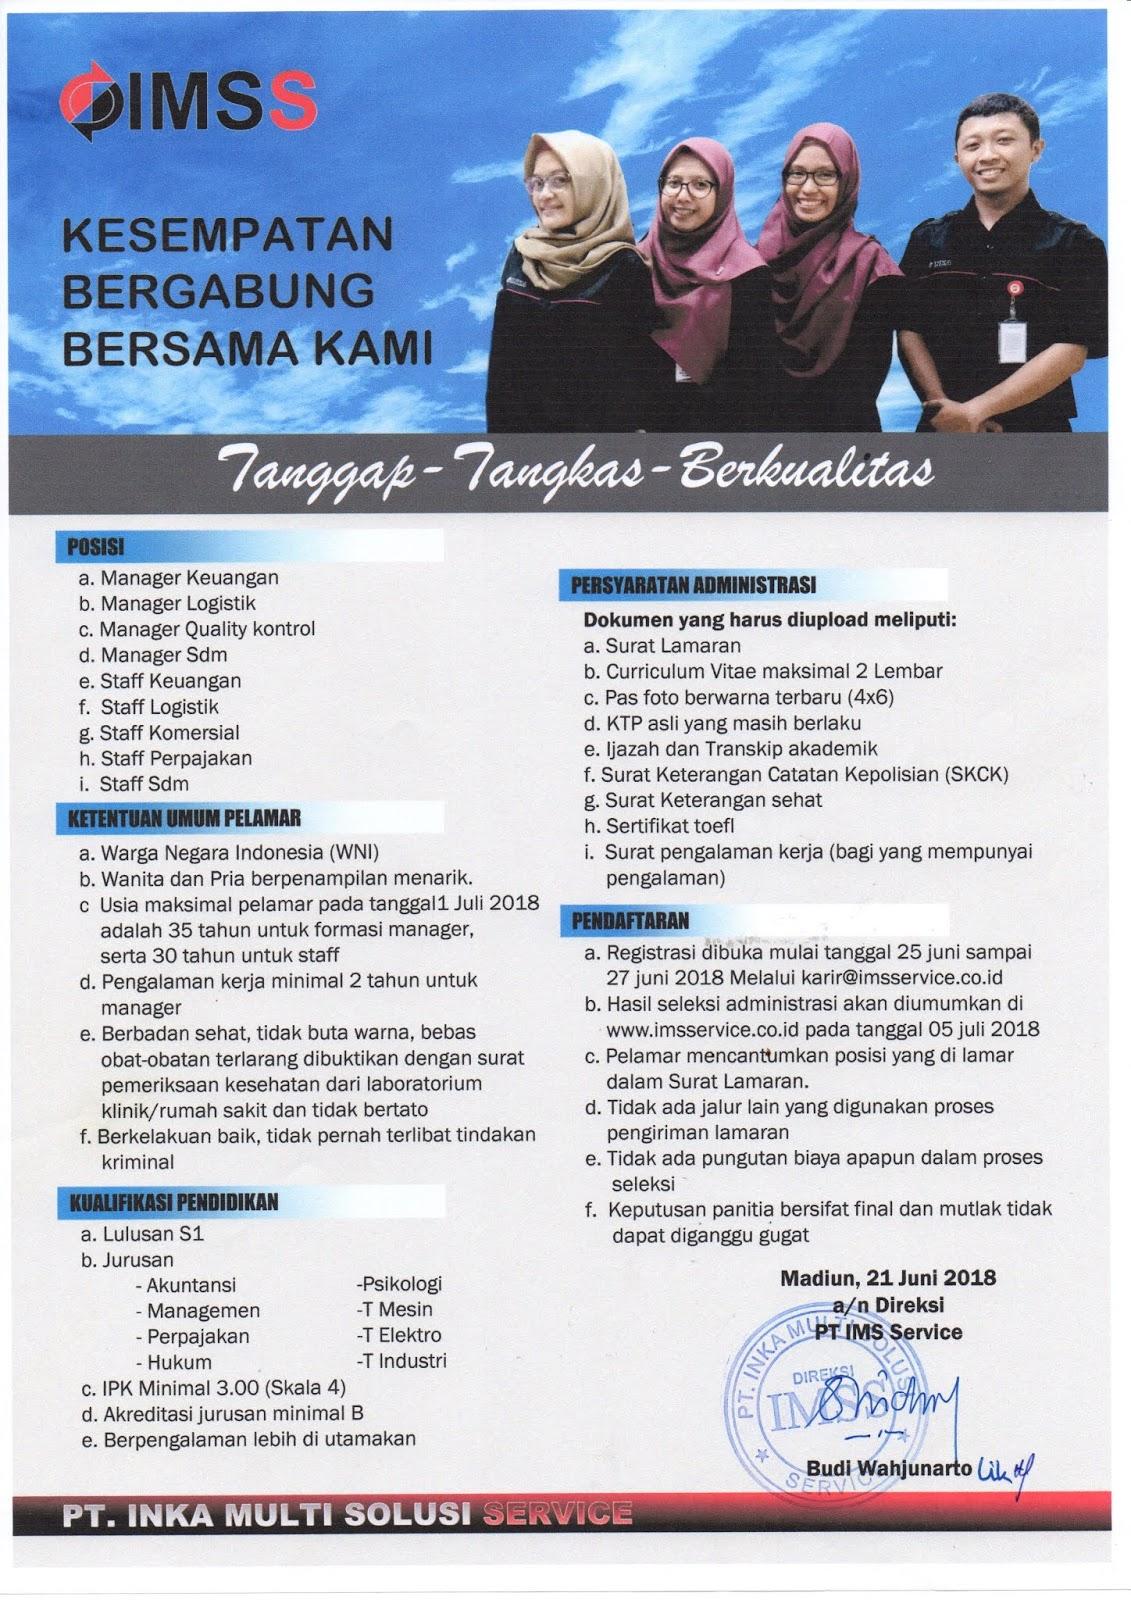 Lowongan Kerja Lowongan Kerja Pt Inka Multi Solusi Service Pt Inka Persero Group